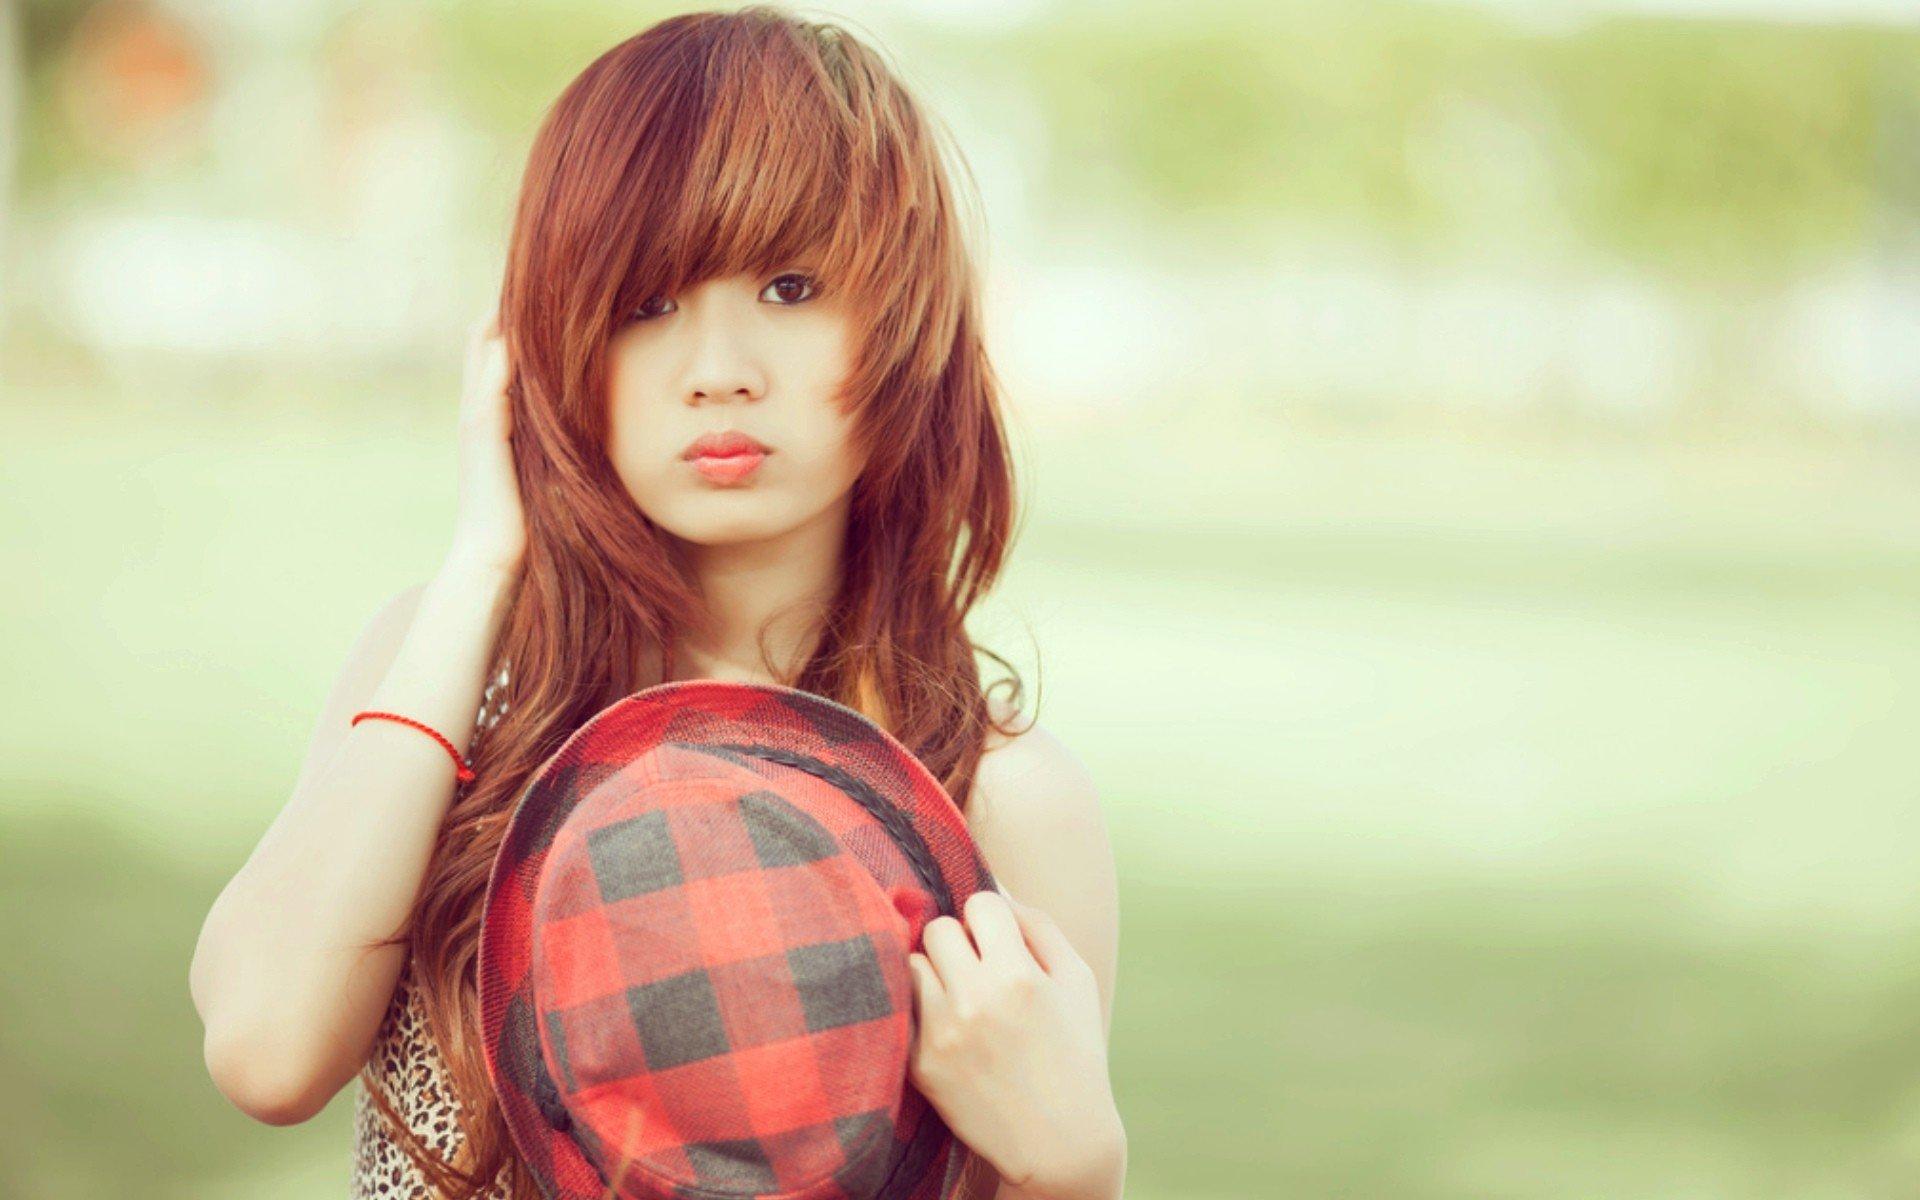 cutegirlwallpapersbeautifulsmilinggirlhdwallpaper cute girl hd